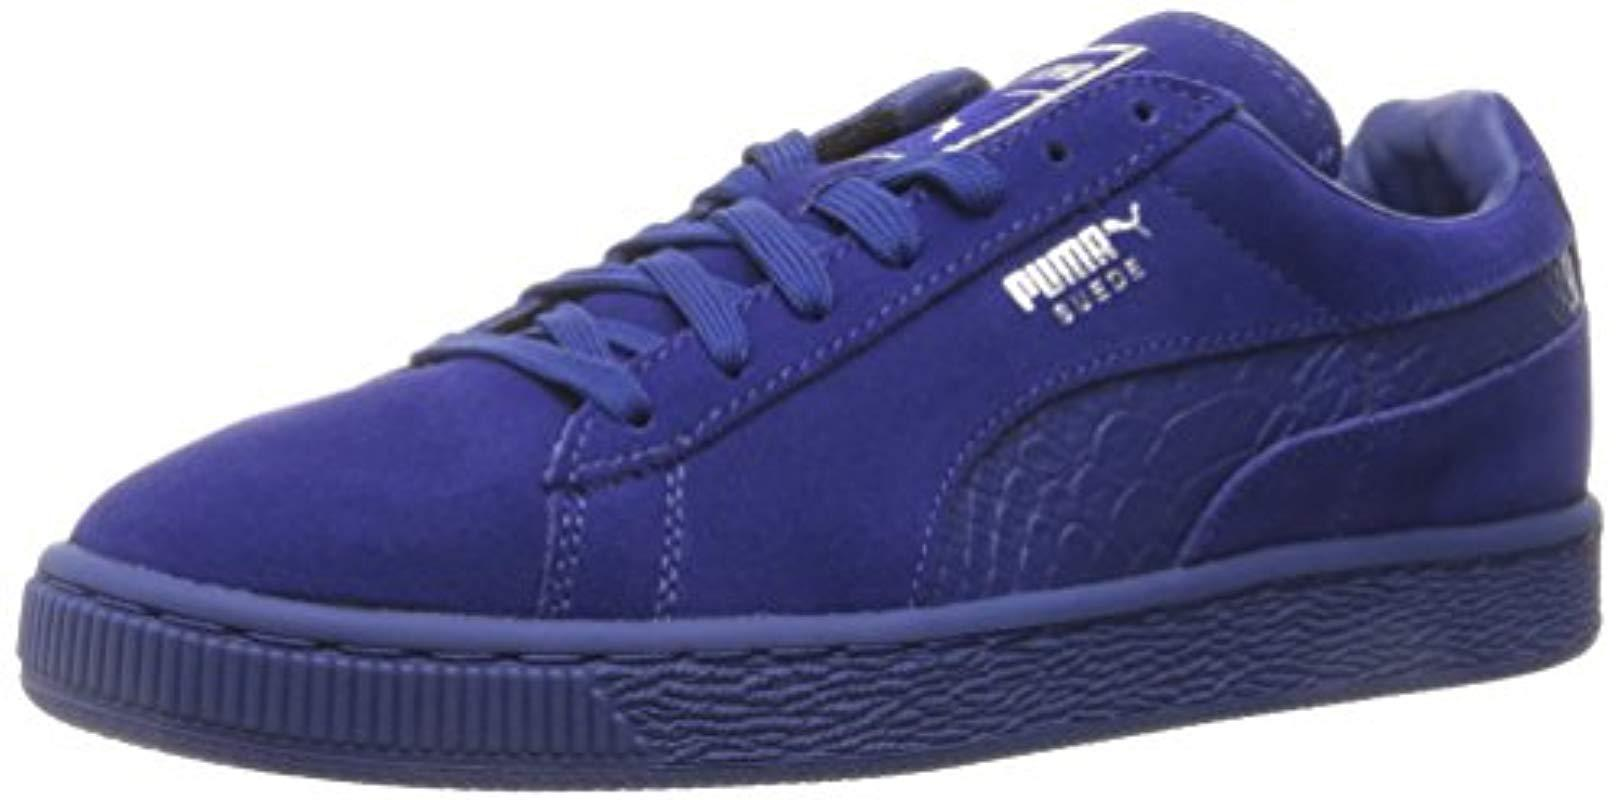 Lyst - PUMA Suede Classic Mono Reptile Fashion Sneaker in Blue for ... 375895b2a